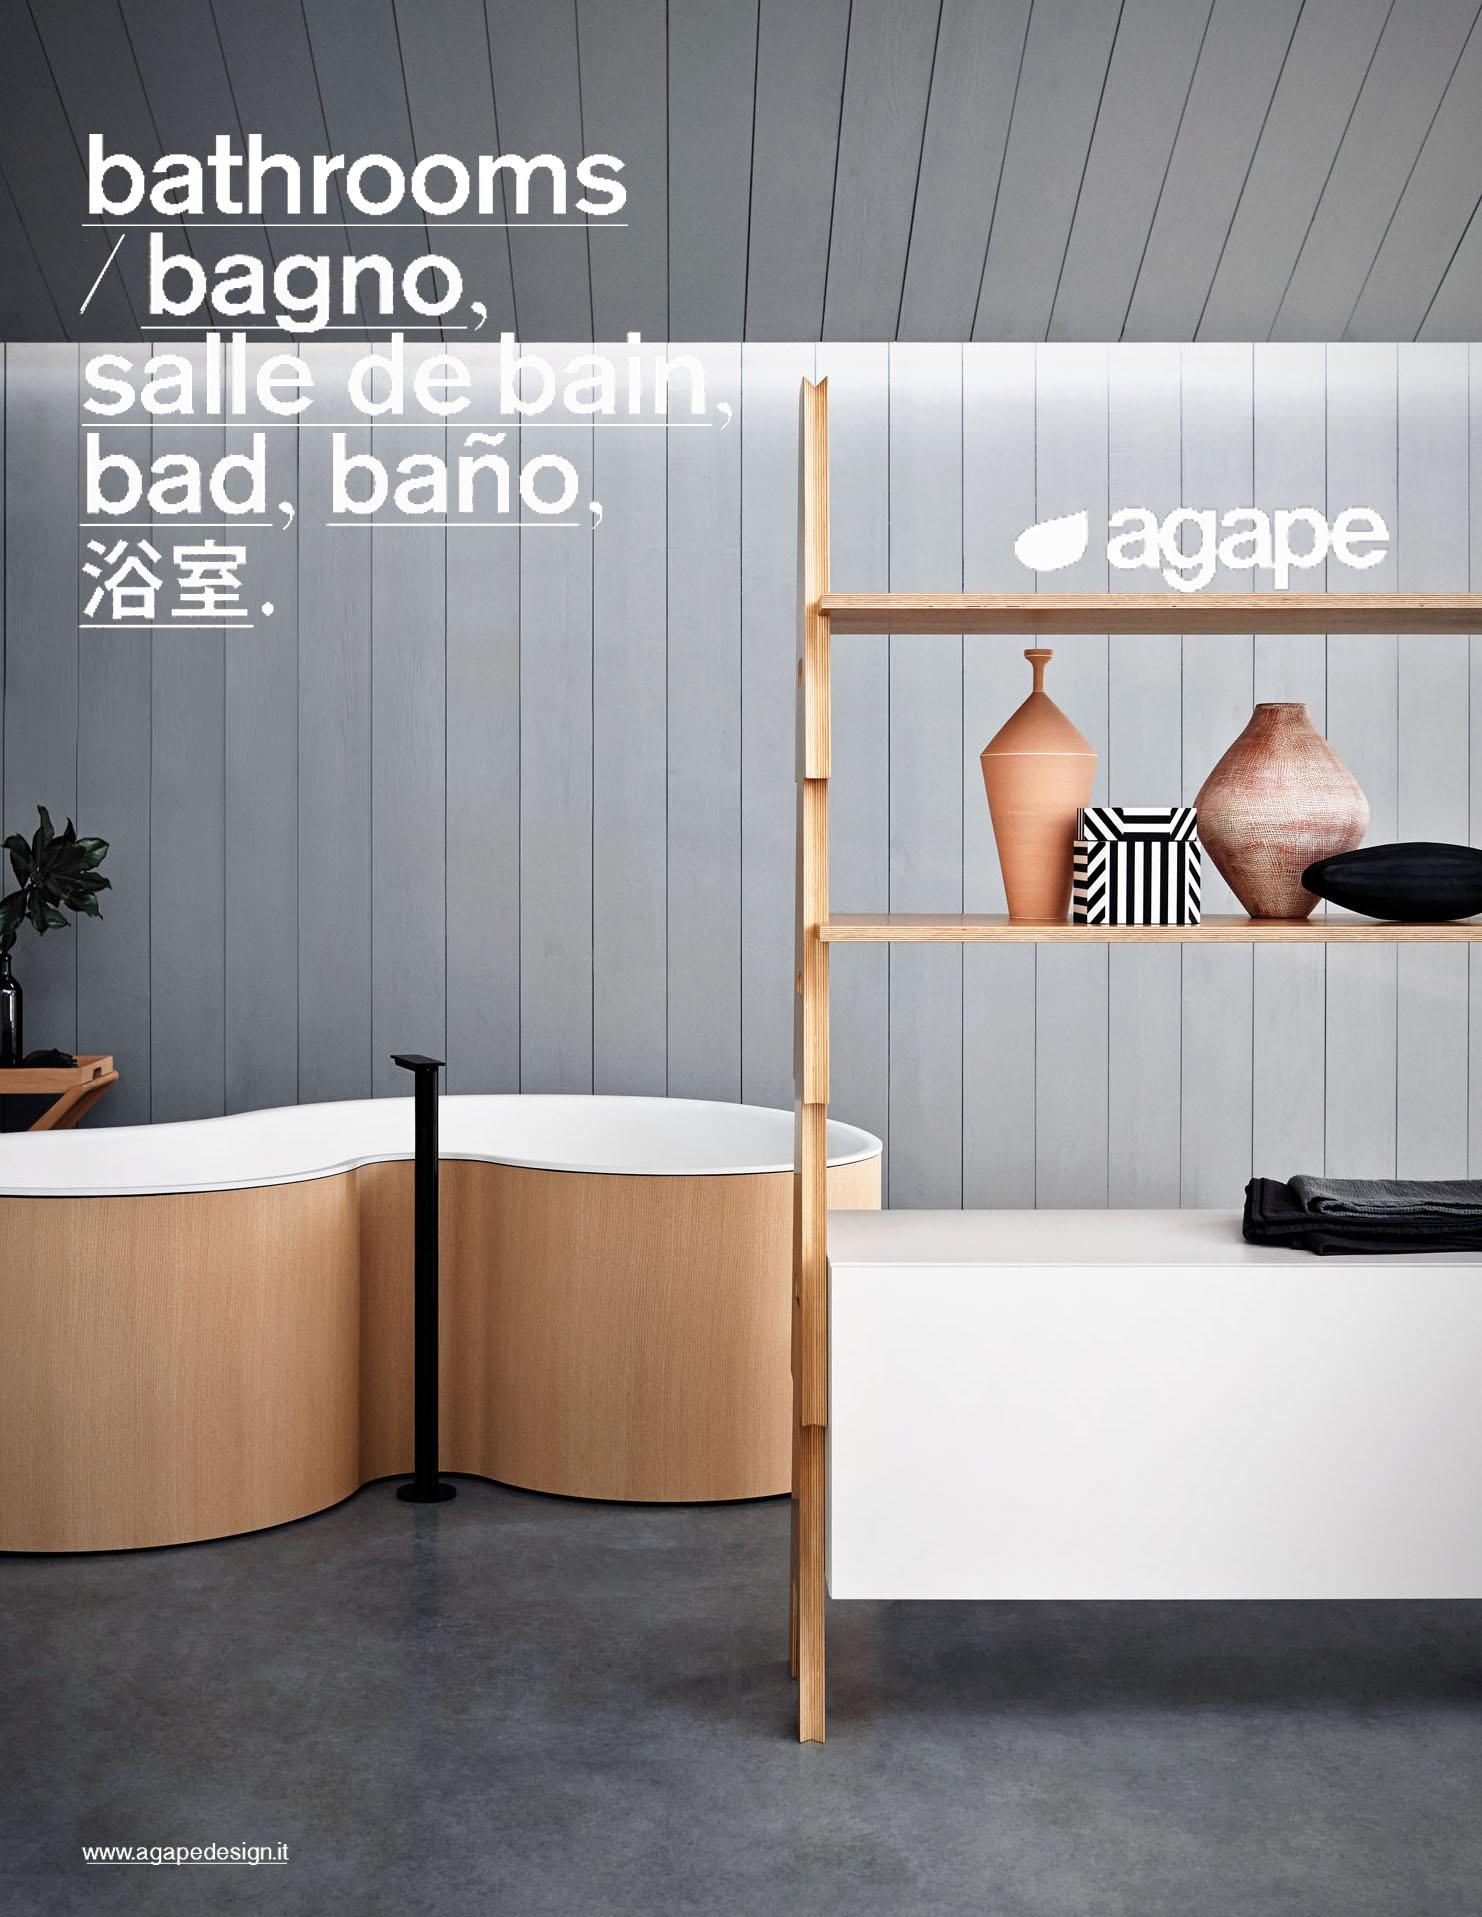 Agape 2015 Campaign | Andrea Ferrari | Agape | Elle Decor | Numerique Retouch Photo Retouching Studio